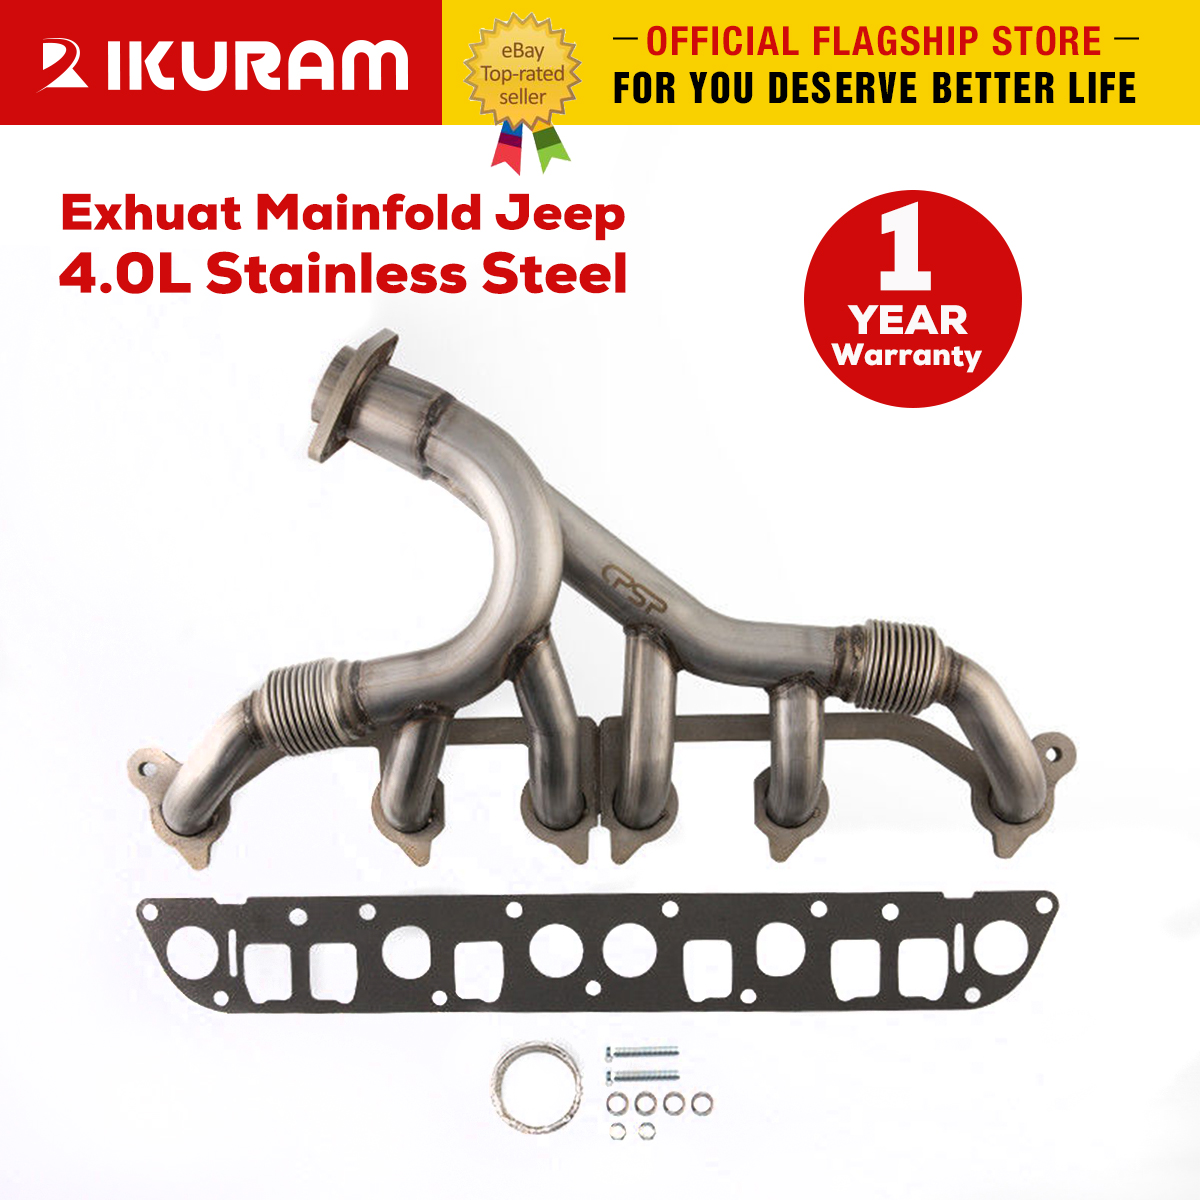 Exhaust Manifold /& Gasket Kit for Wrangler Grand Cherokee 4.0L Stainless Steel